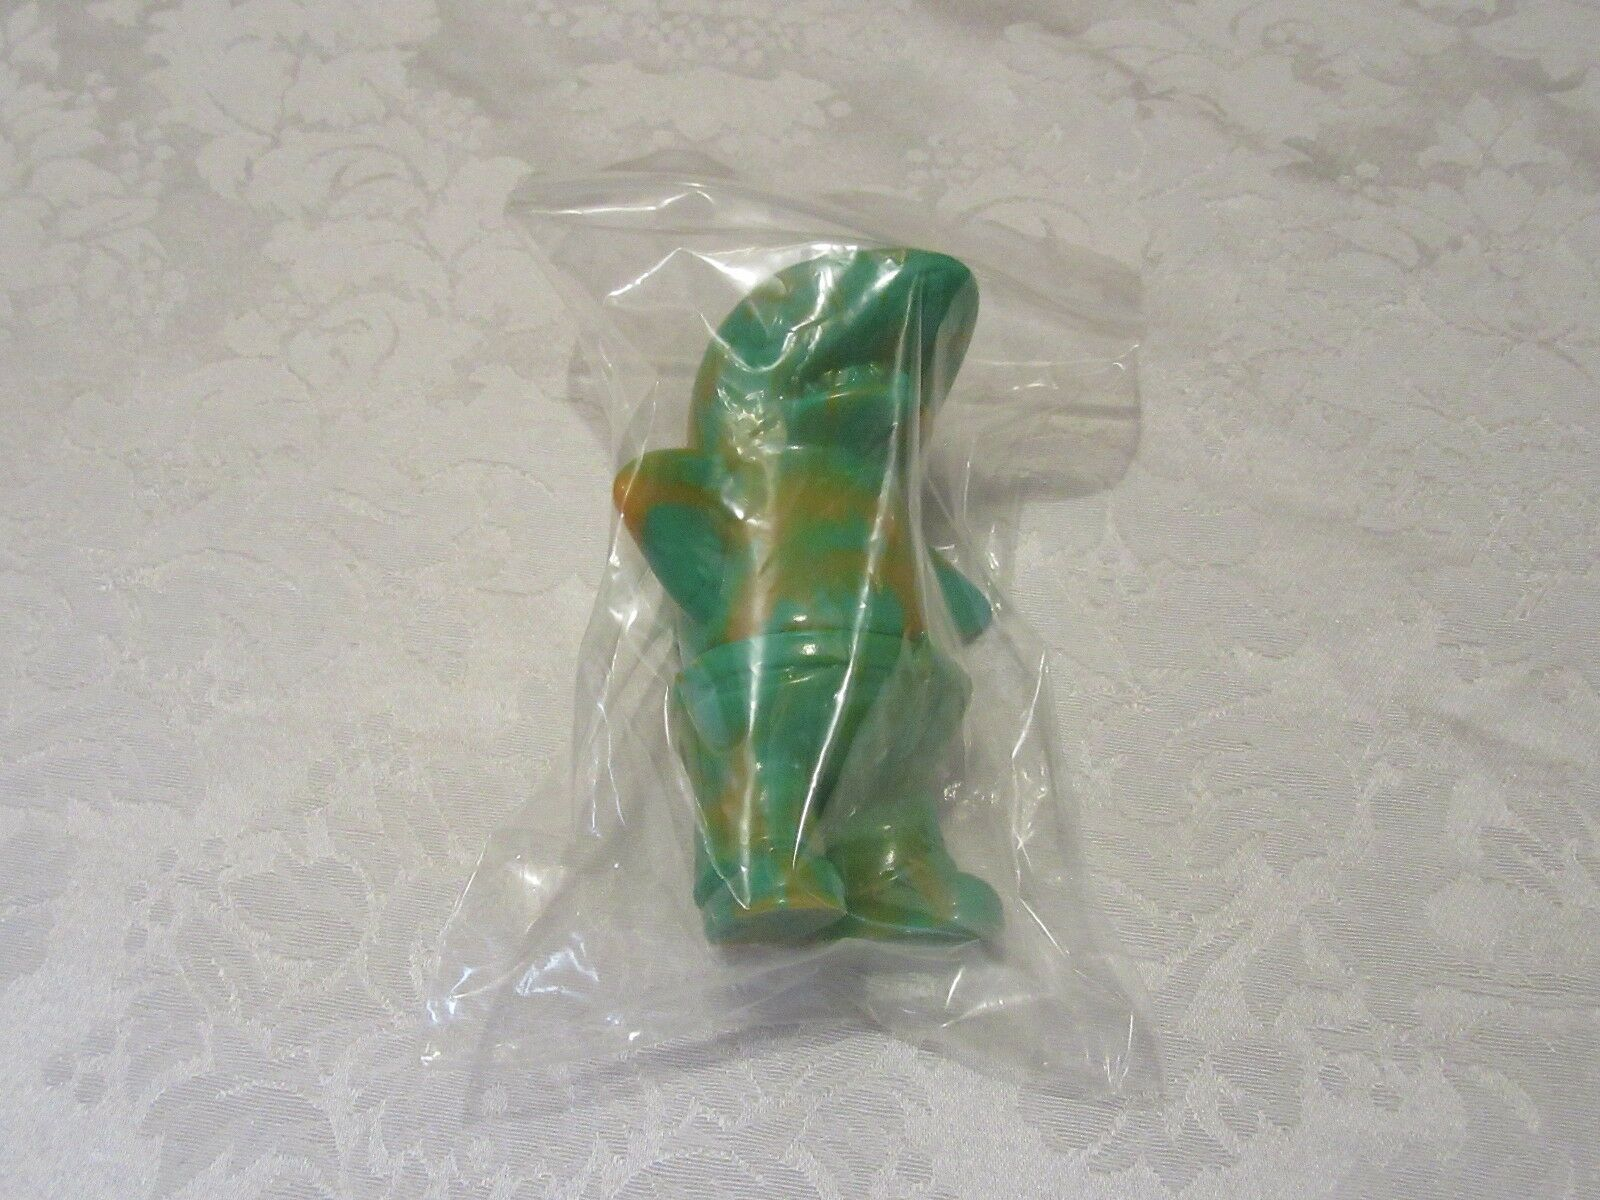 Koji Harmon CometDebris Sametan verde Marbled Swirl Dark arancia Sofubi  Vinyl  moda classica